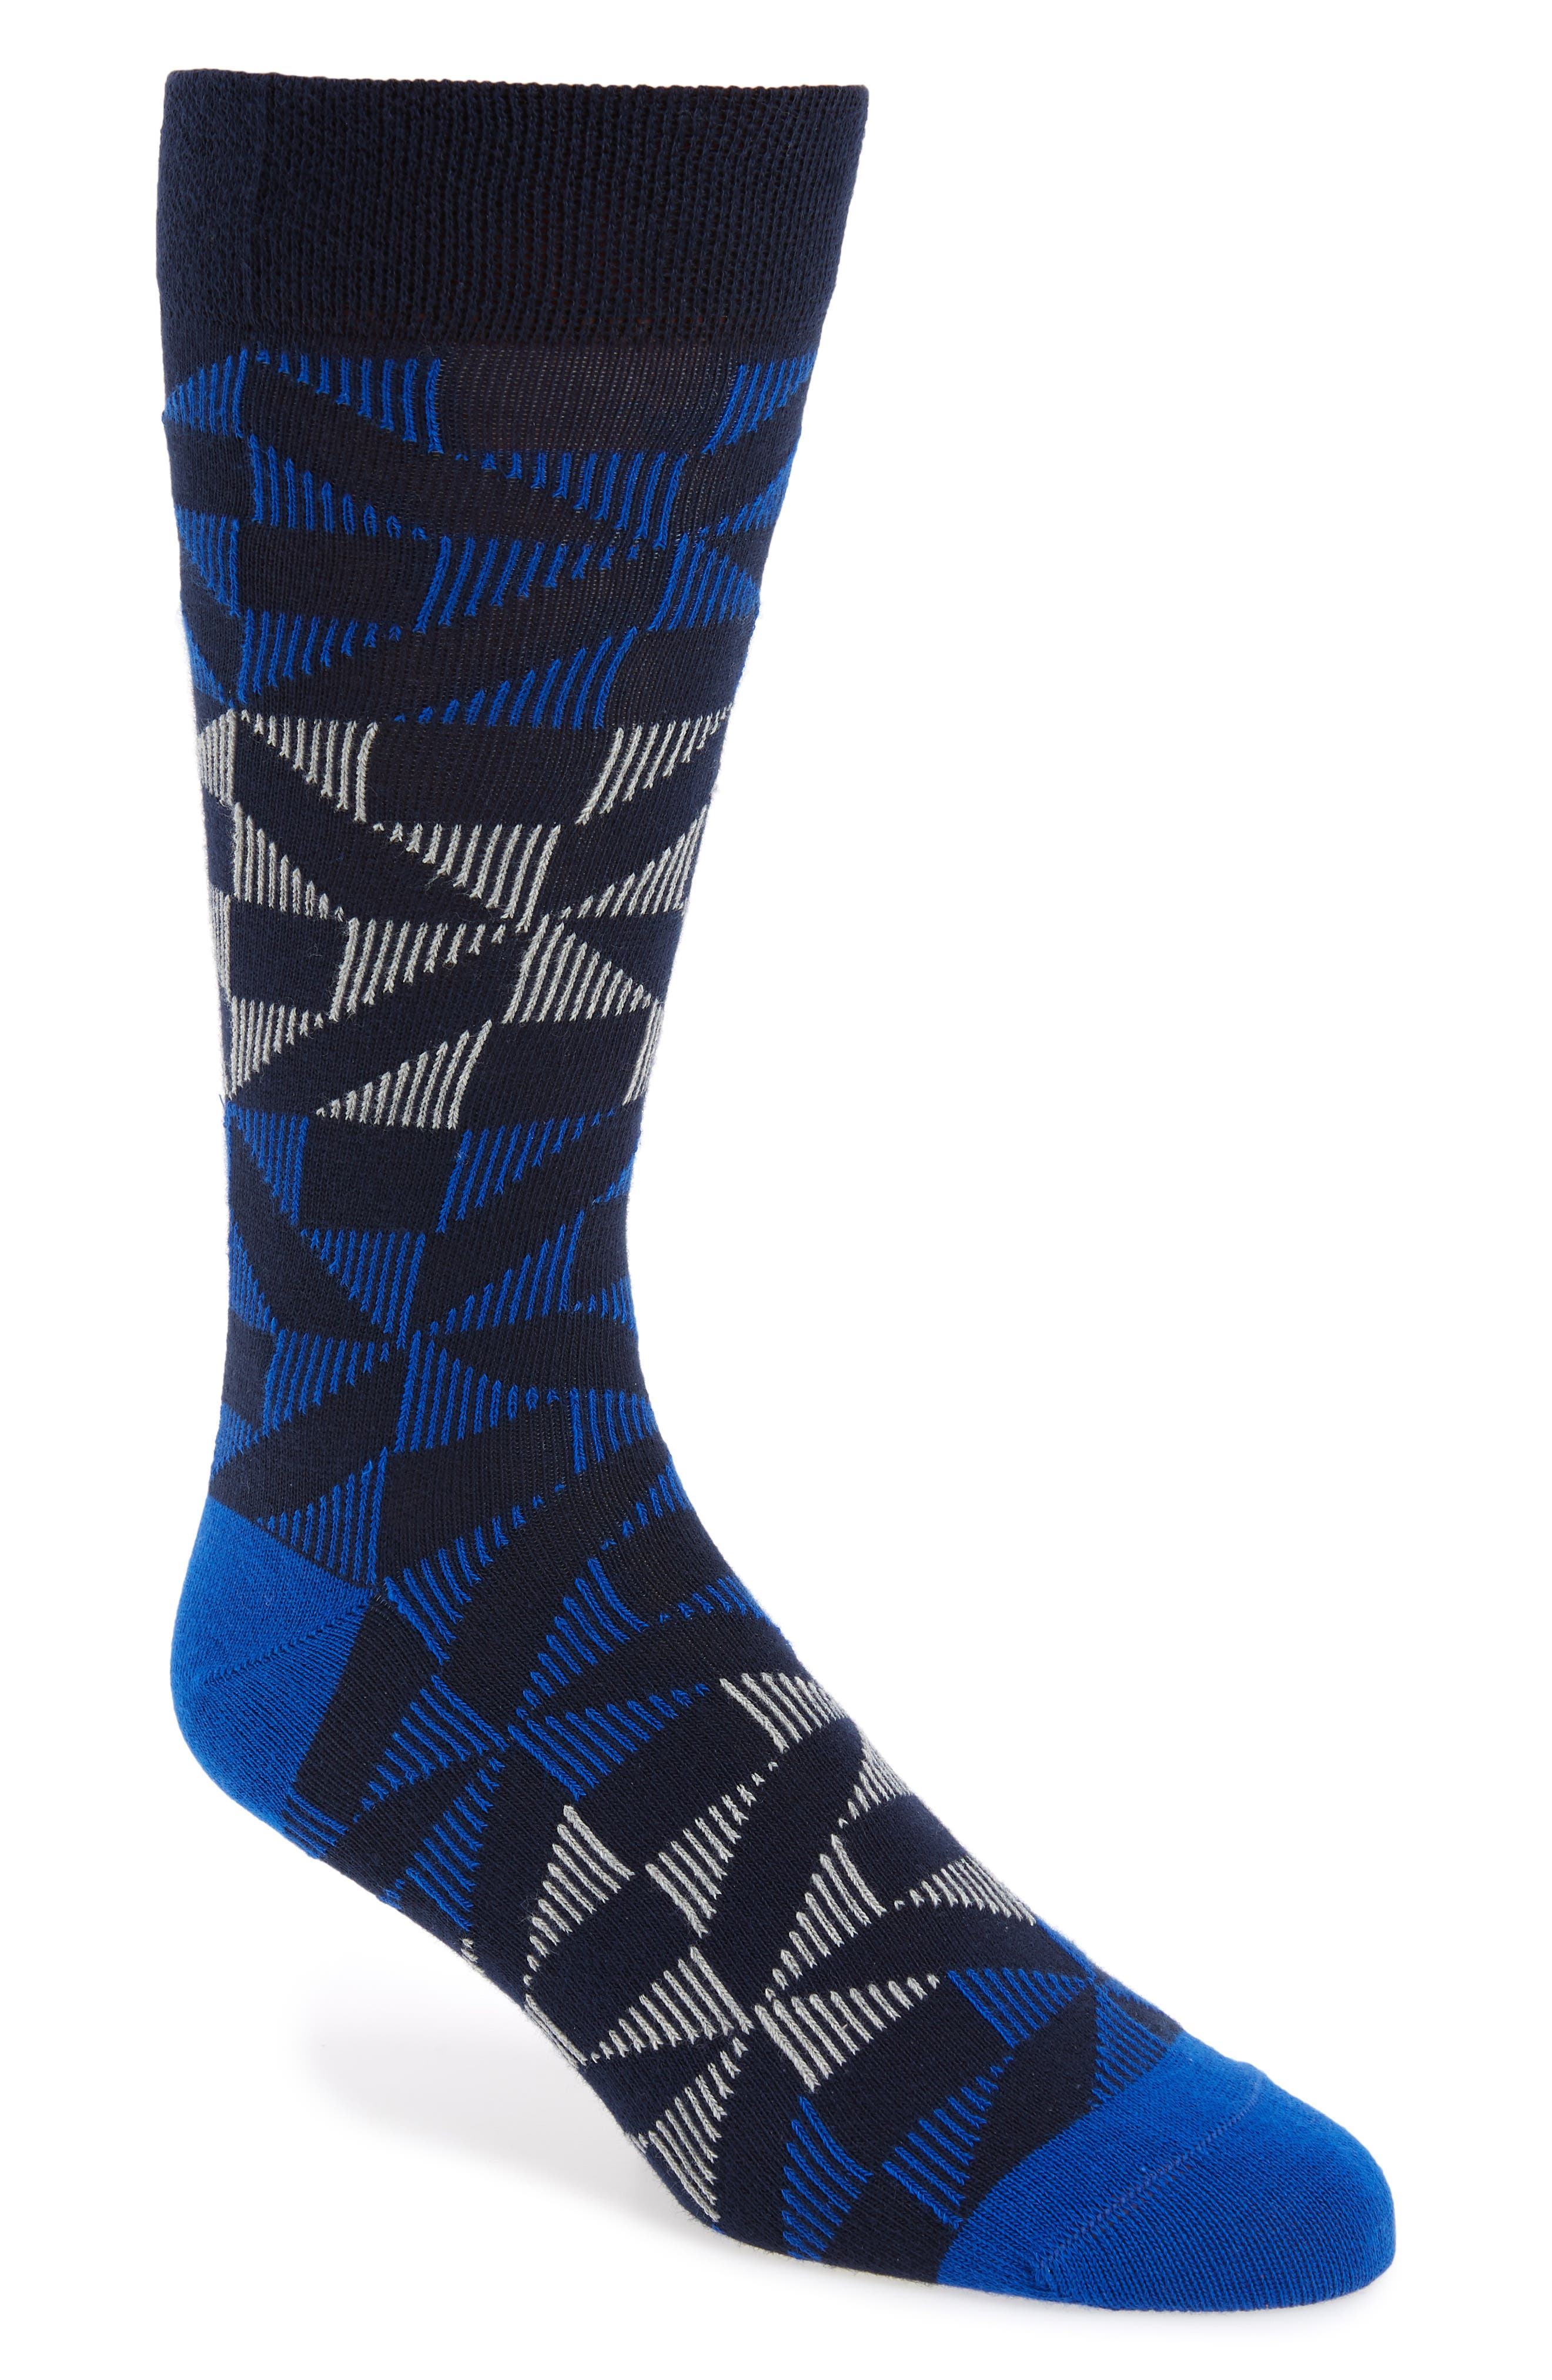 Newhome Geometric Socks,                             Main thumbnail 1, color,                             Blue